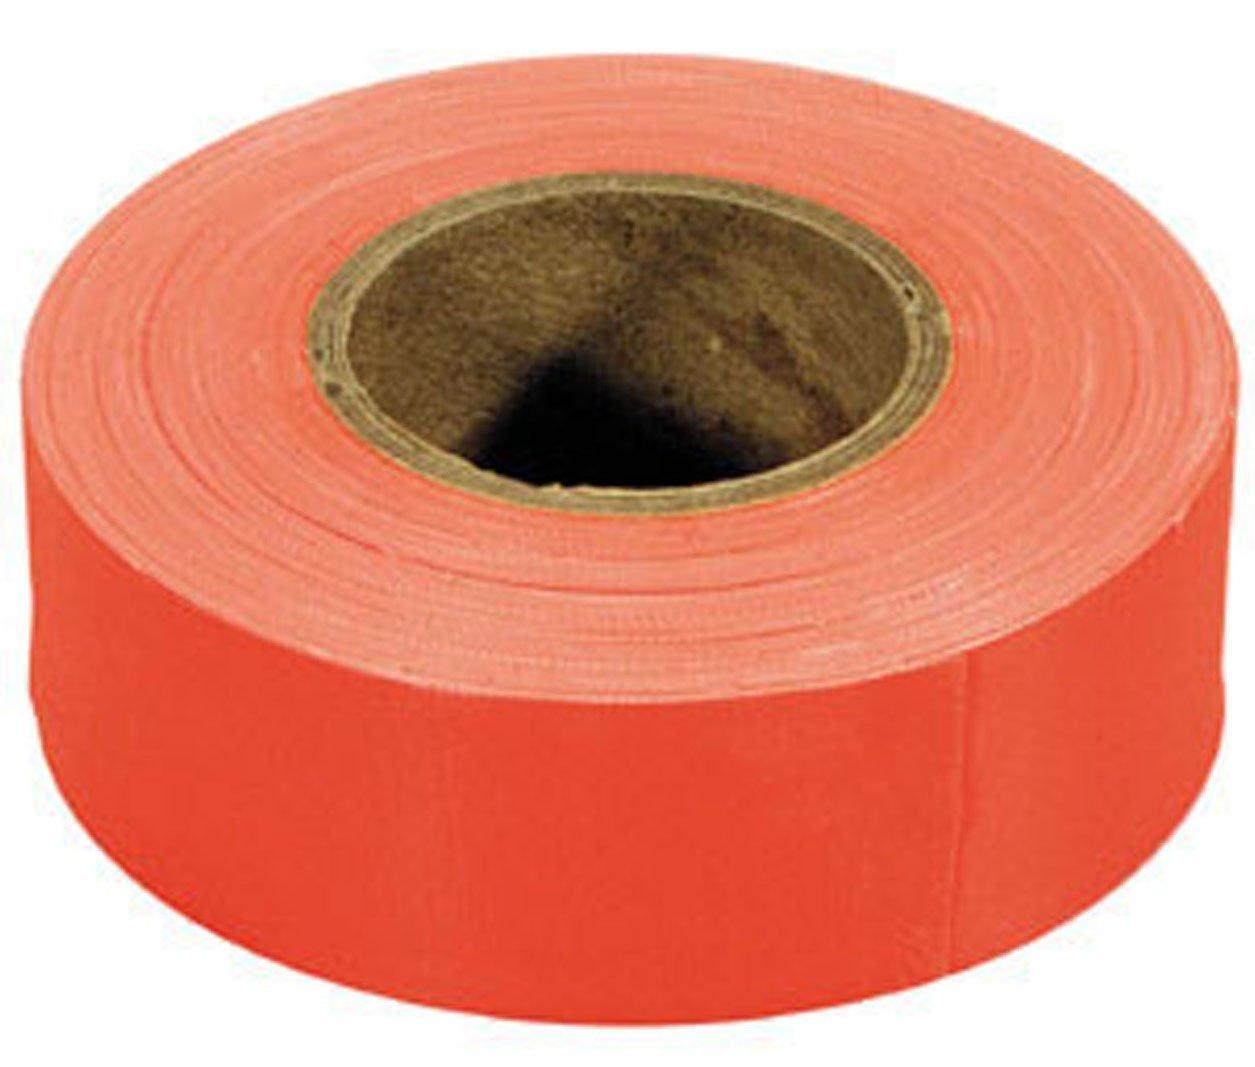 IRWIN Tools STRAIT-LINE Flagging Tape, 150-foot, Glo-Orange - $1.69 at Amazon